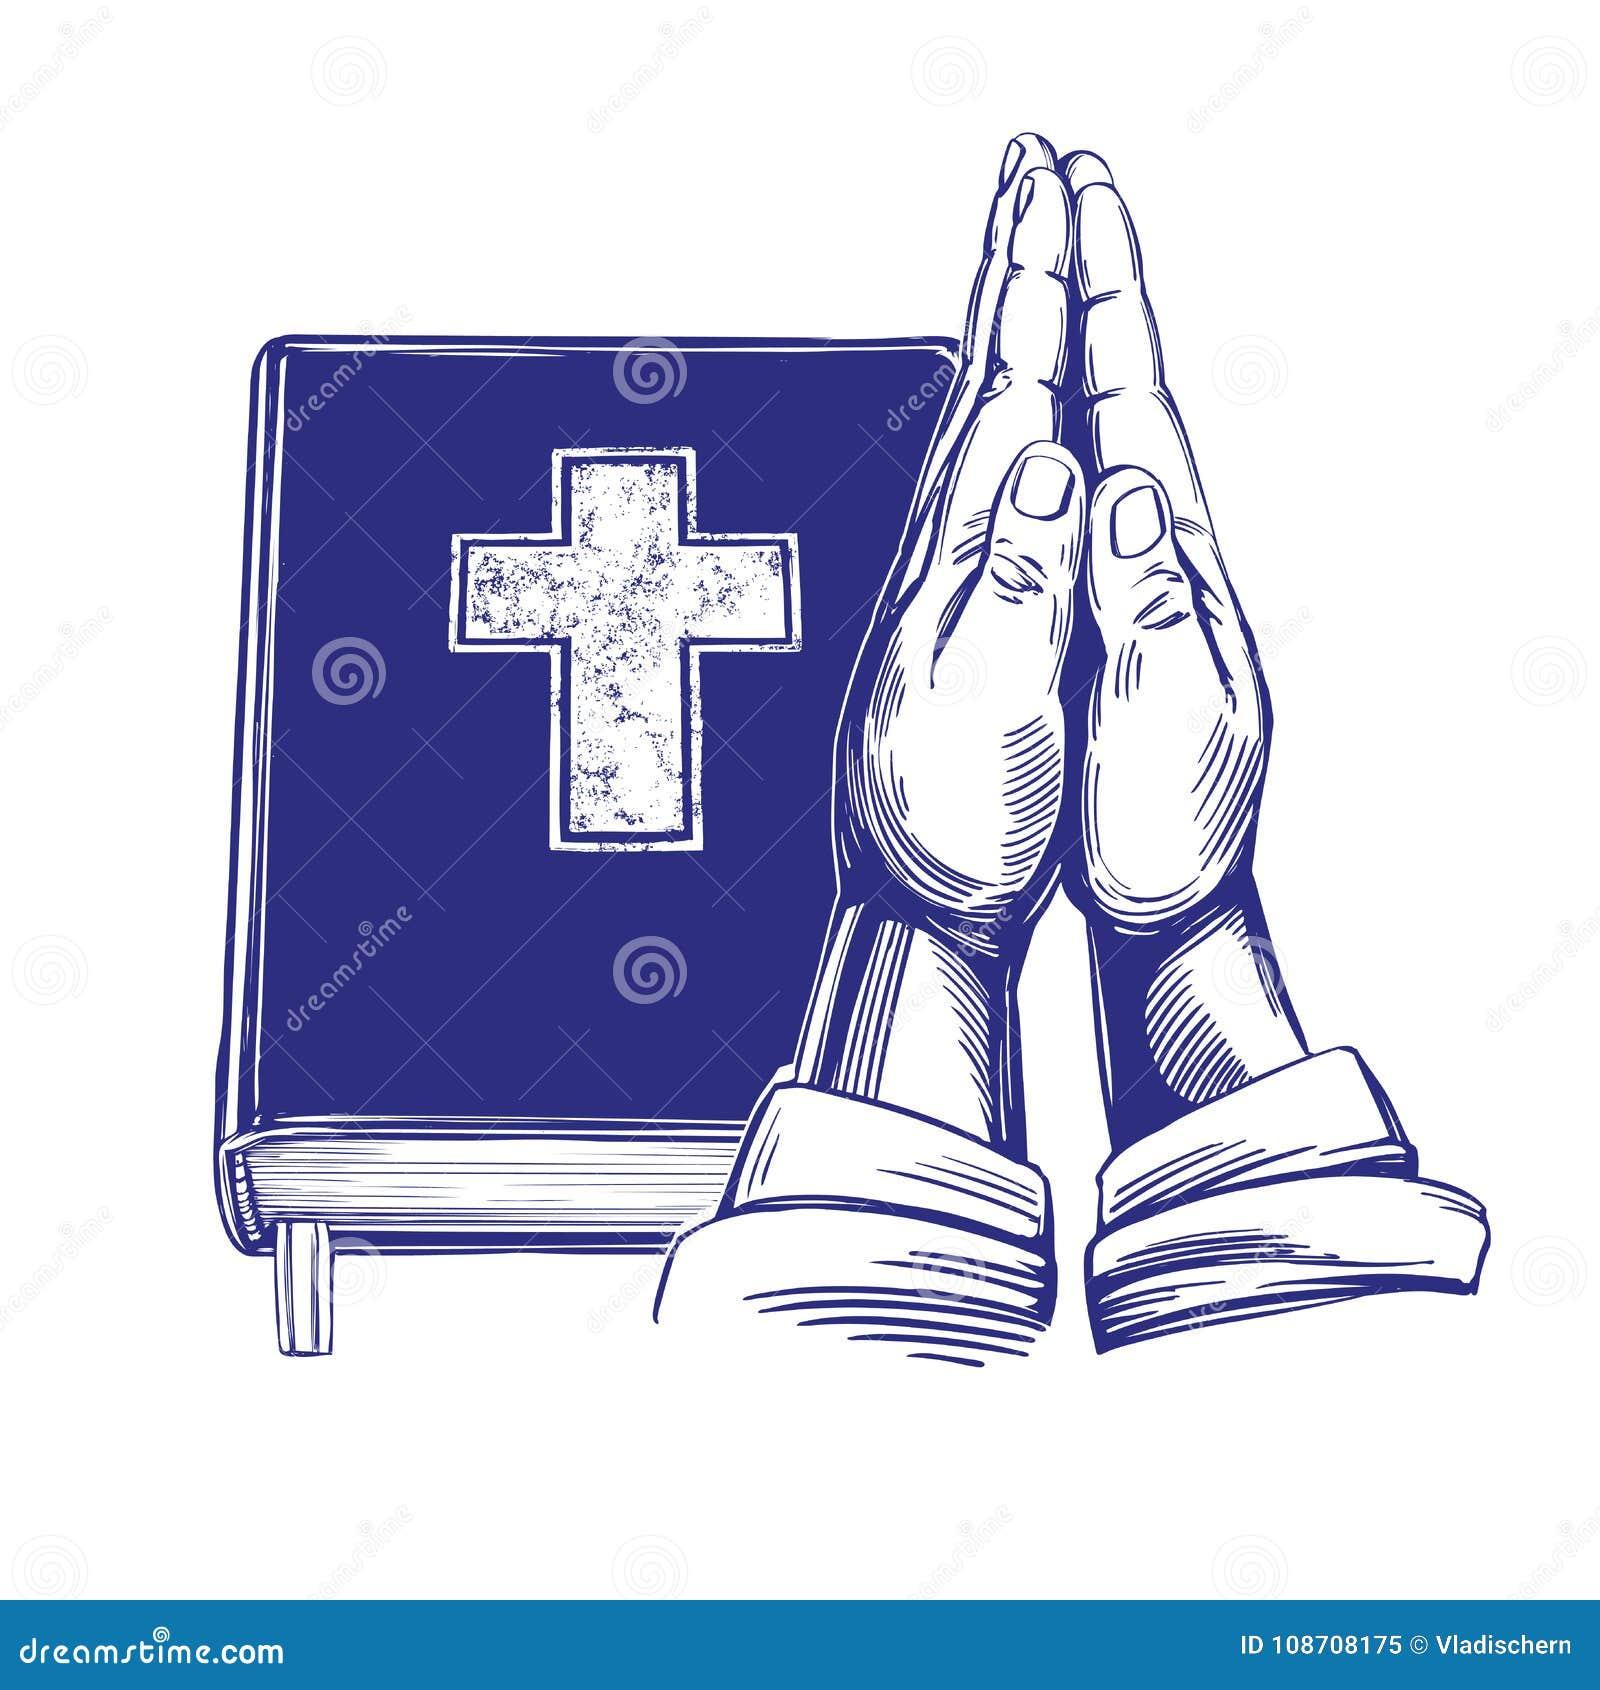 Praying Hands Bible Gospel The Doctrine Of Christianity Symbol